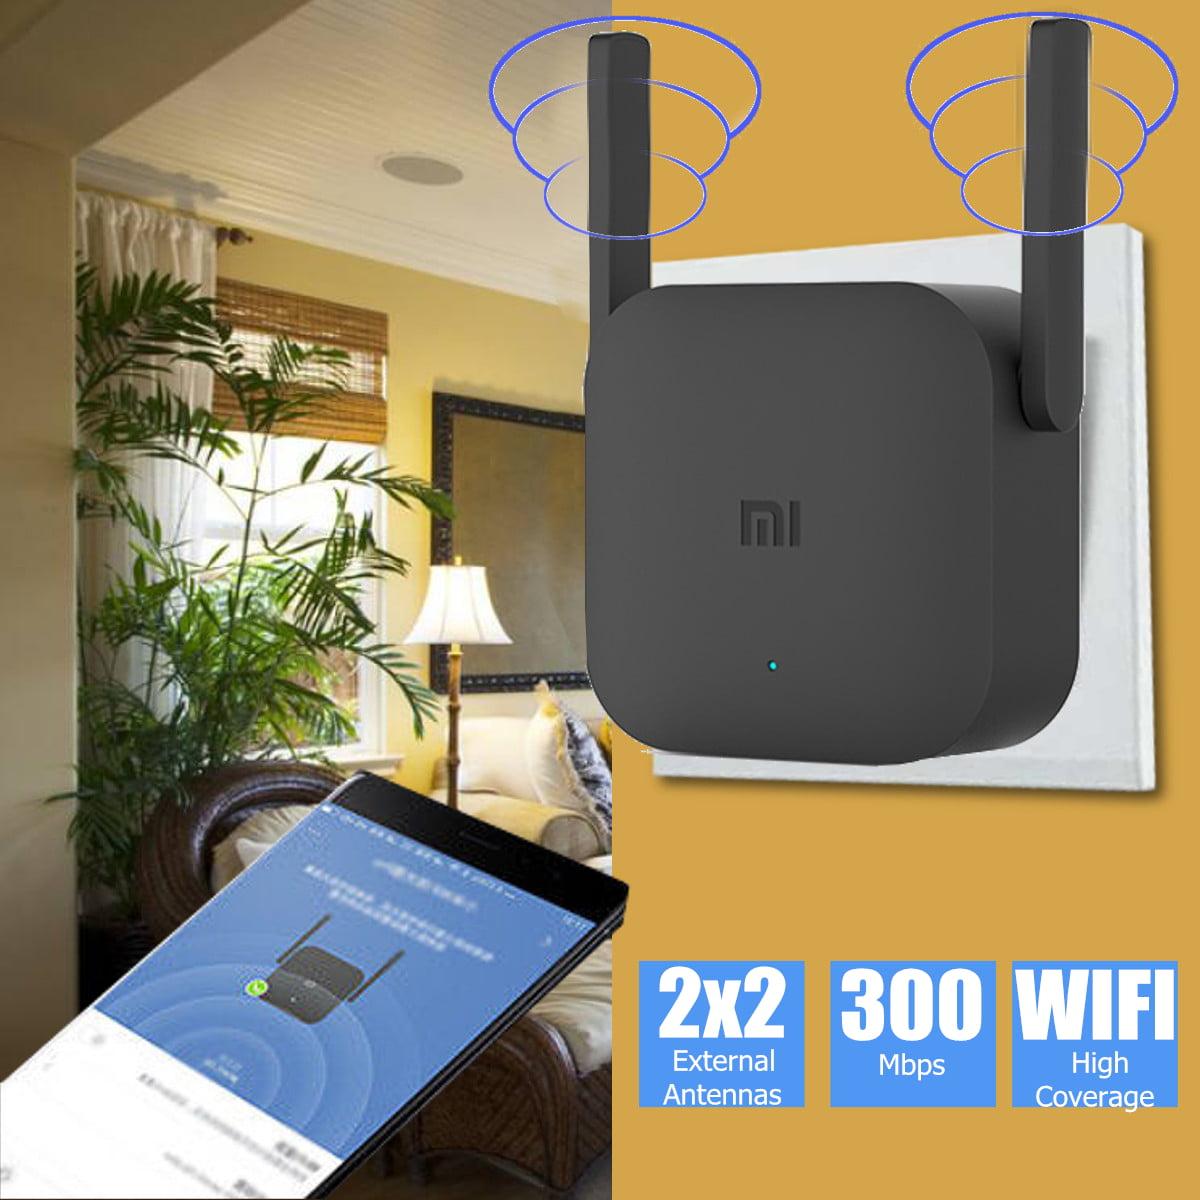 Moaere Pro 300Mbs WiFi Range Extender Internet Booster ...